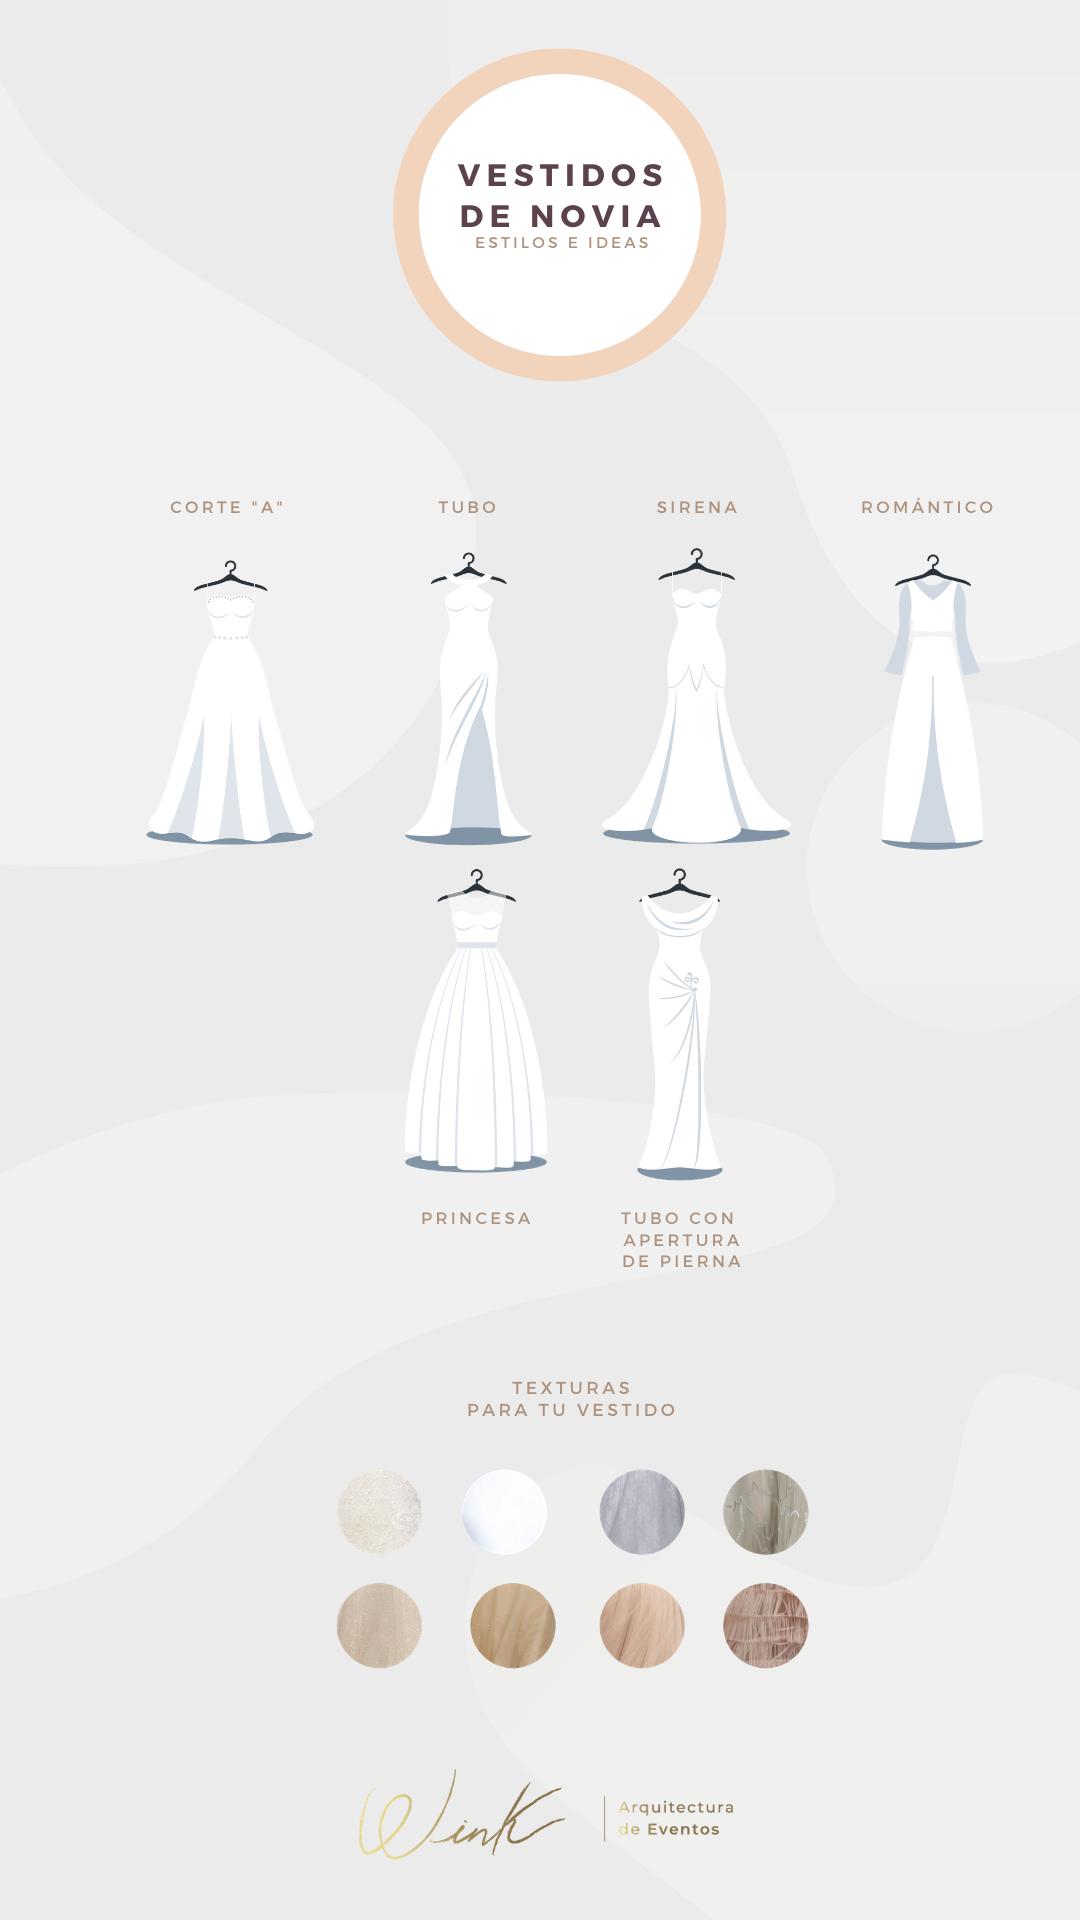 Estilos De Vestido De Novia Estilos De Vestidos De Novia Vestidos De Novia Vestir Con Estilo